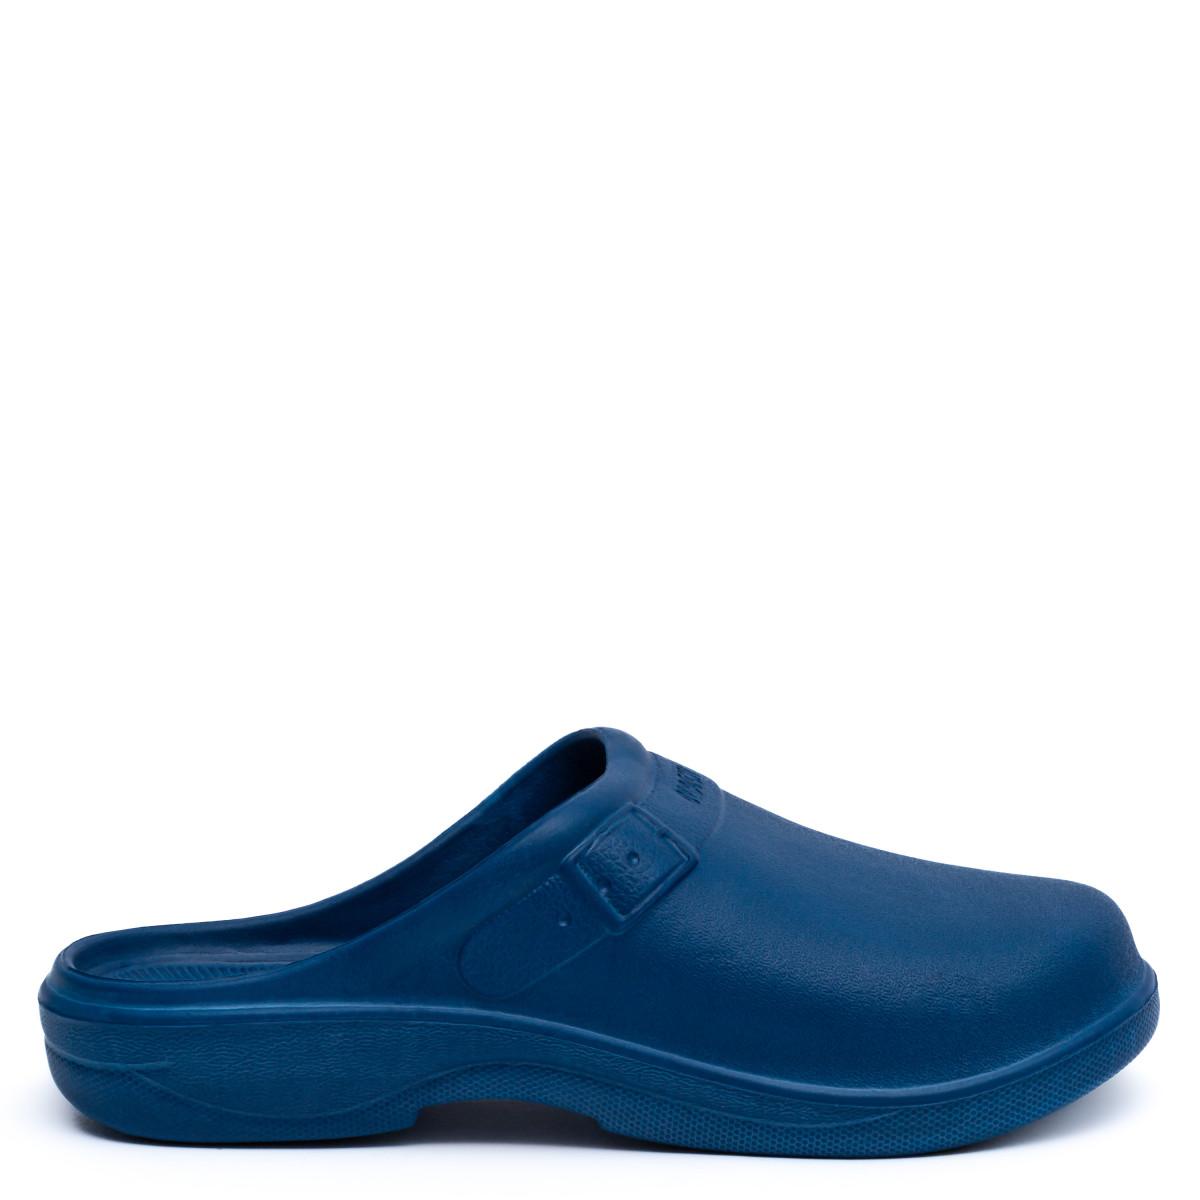 Crocks EVA, Blue